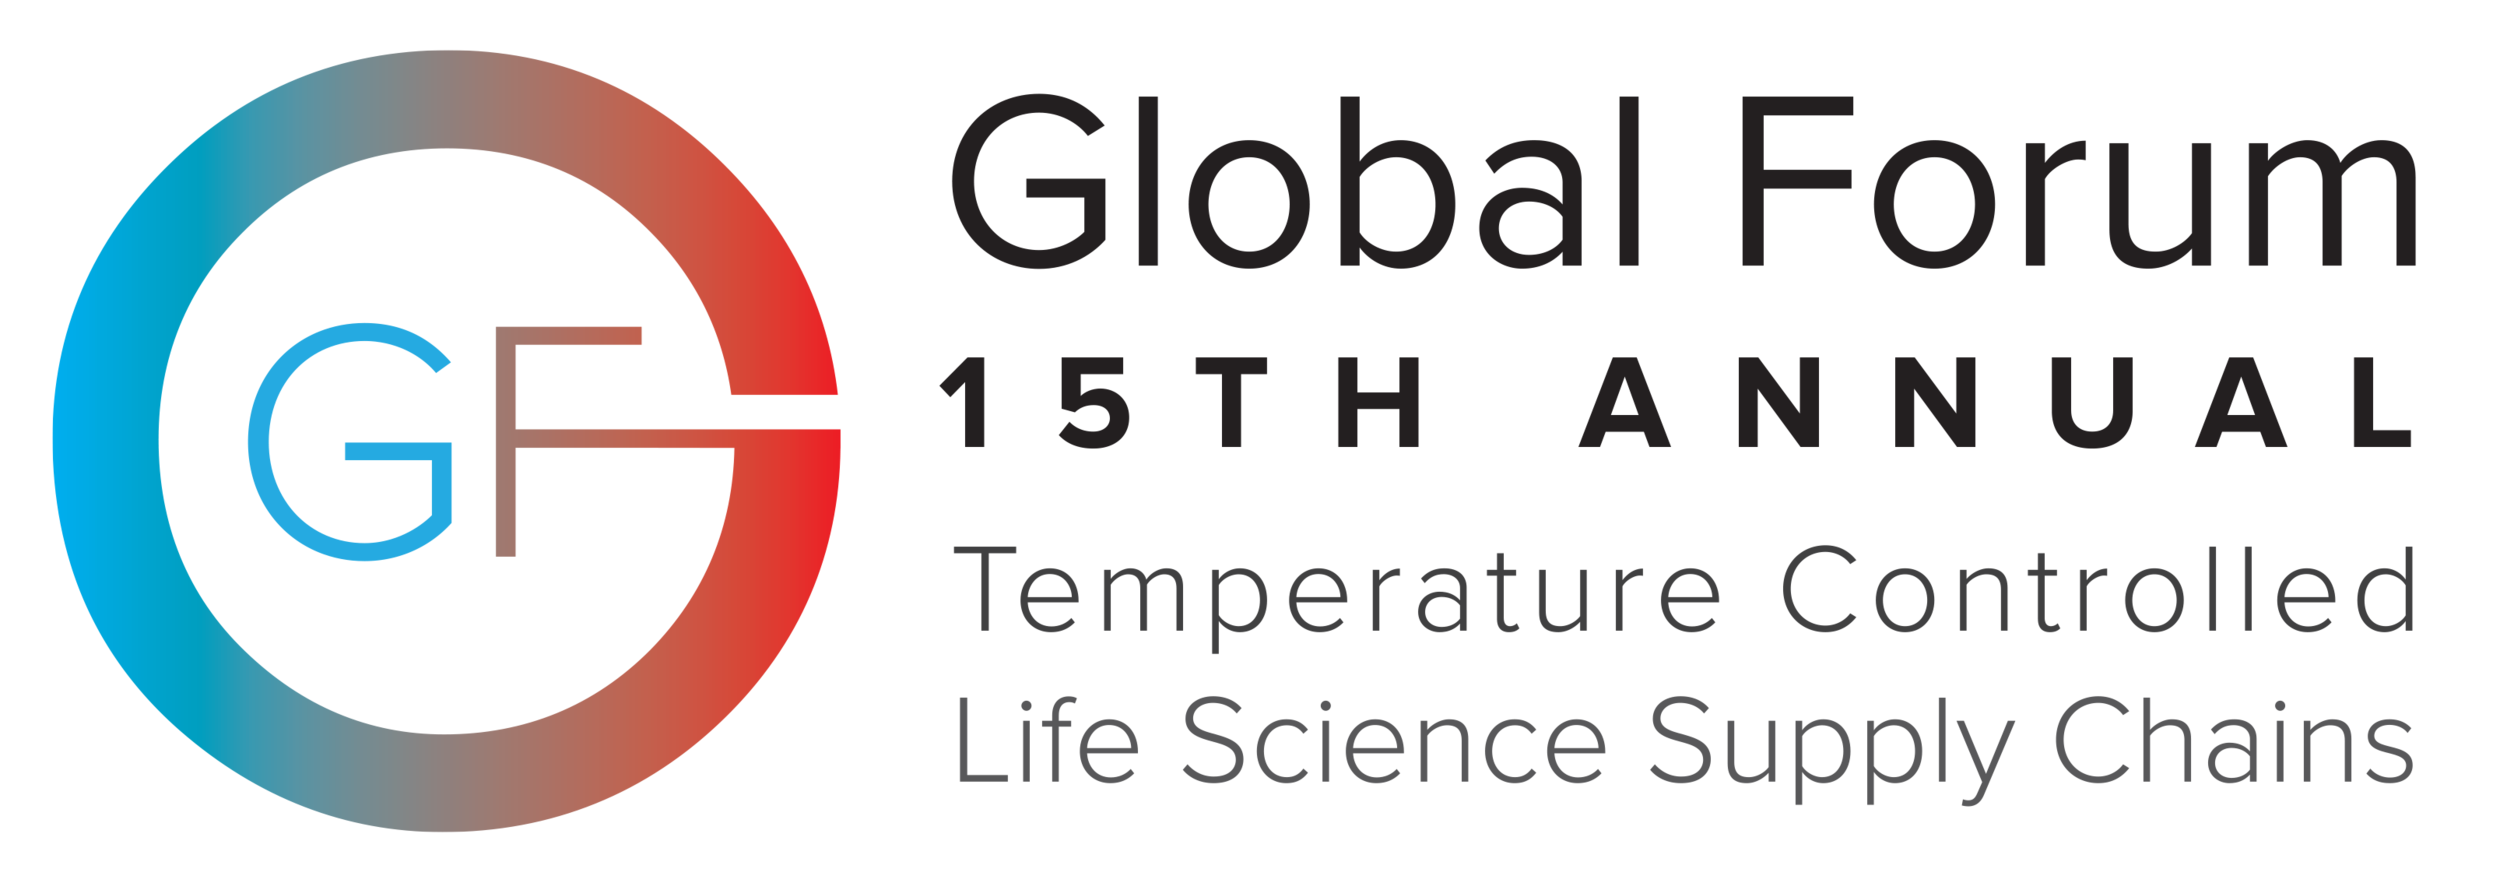 15th Annual Global Forum